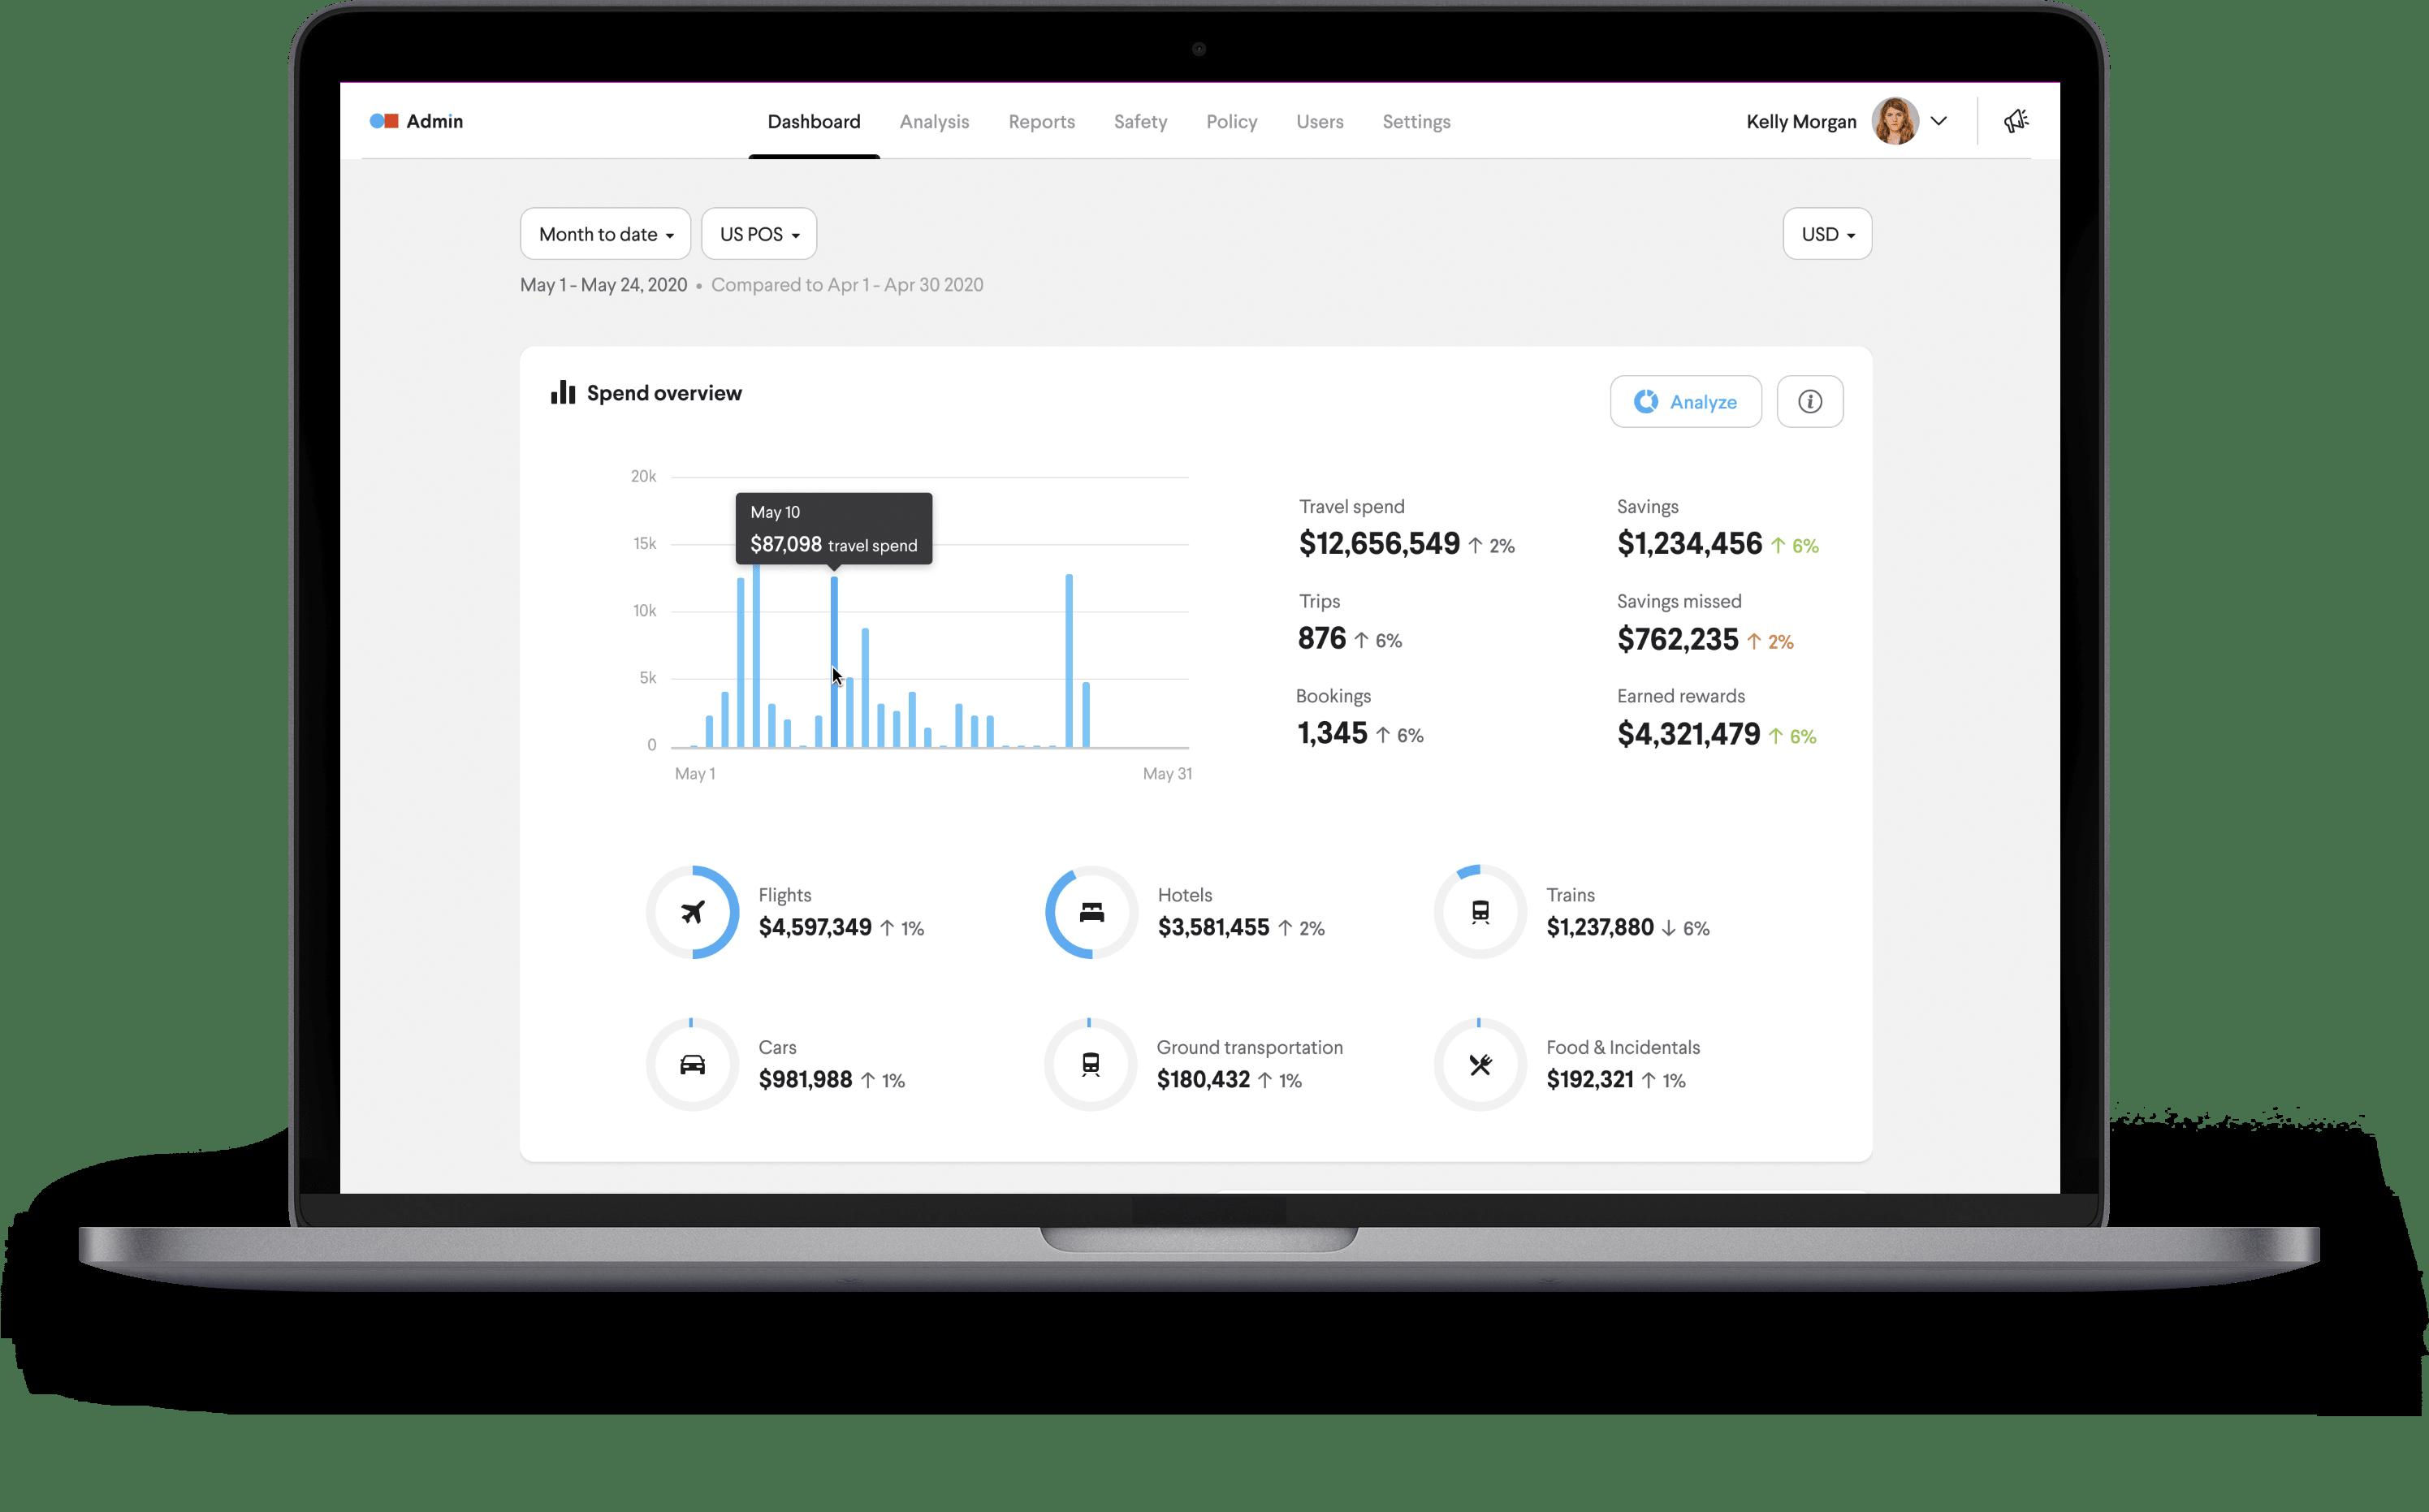 TripActions admin dashboard view